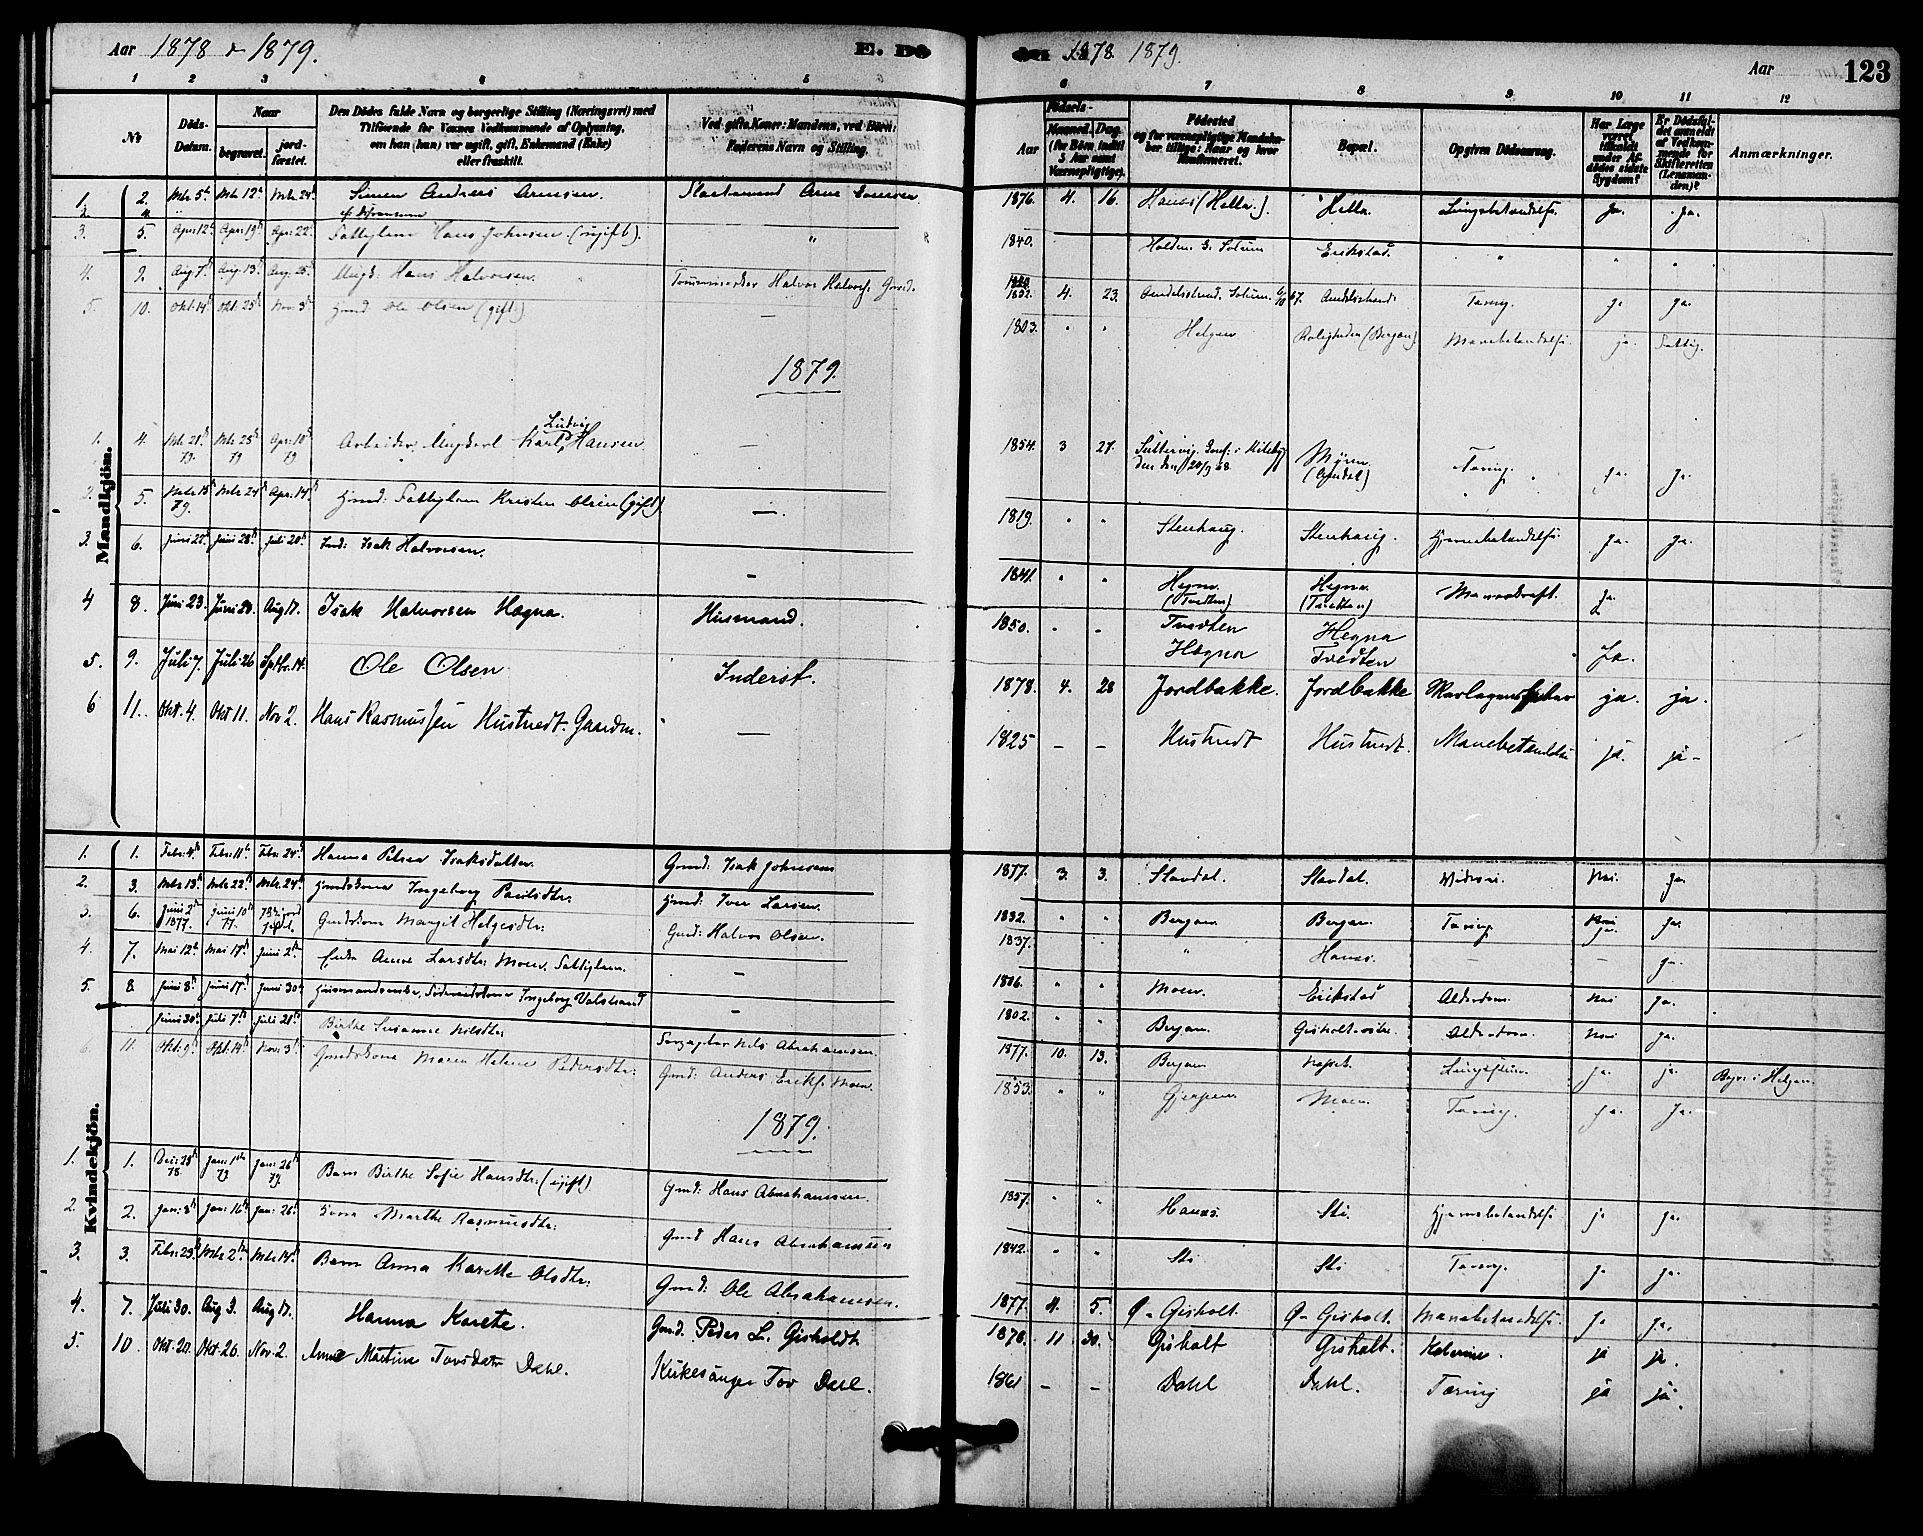 SAKO, Solum kirkebøker, F/Fb/L0001: Ministerialbok nr. II 1, 1877-1892, s. 123